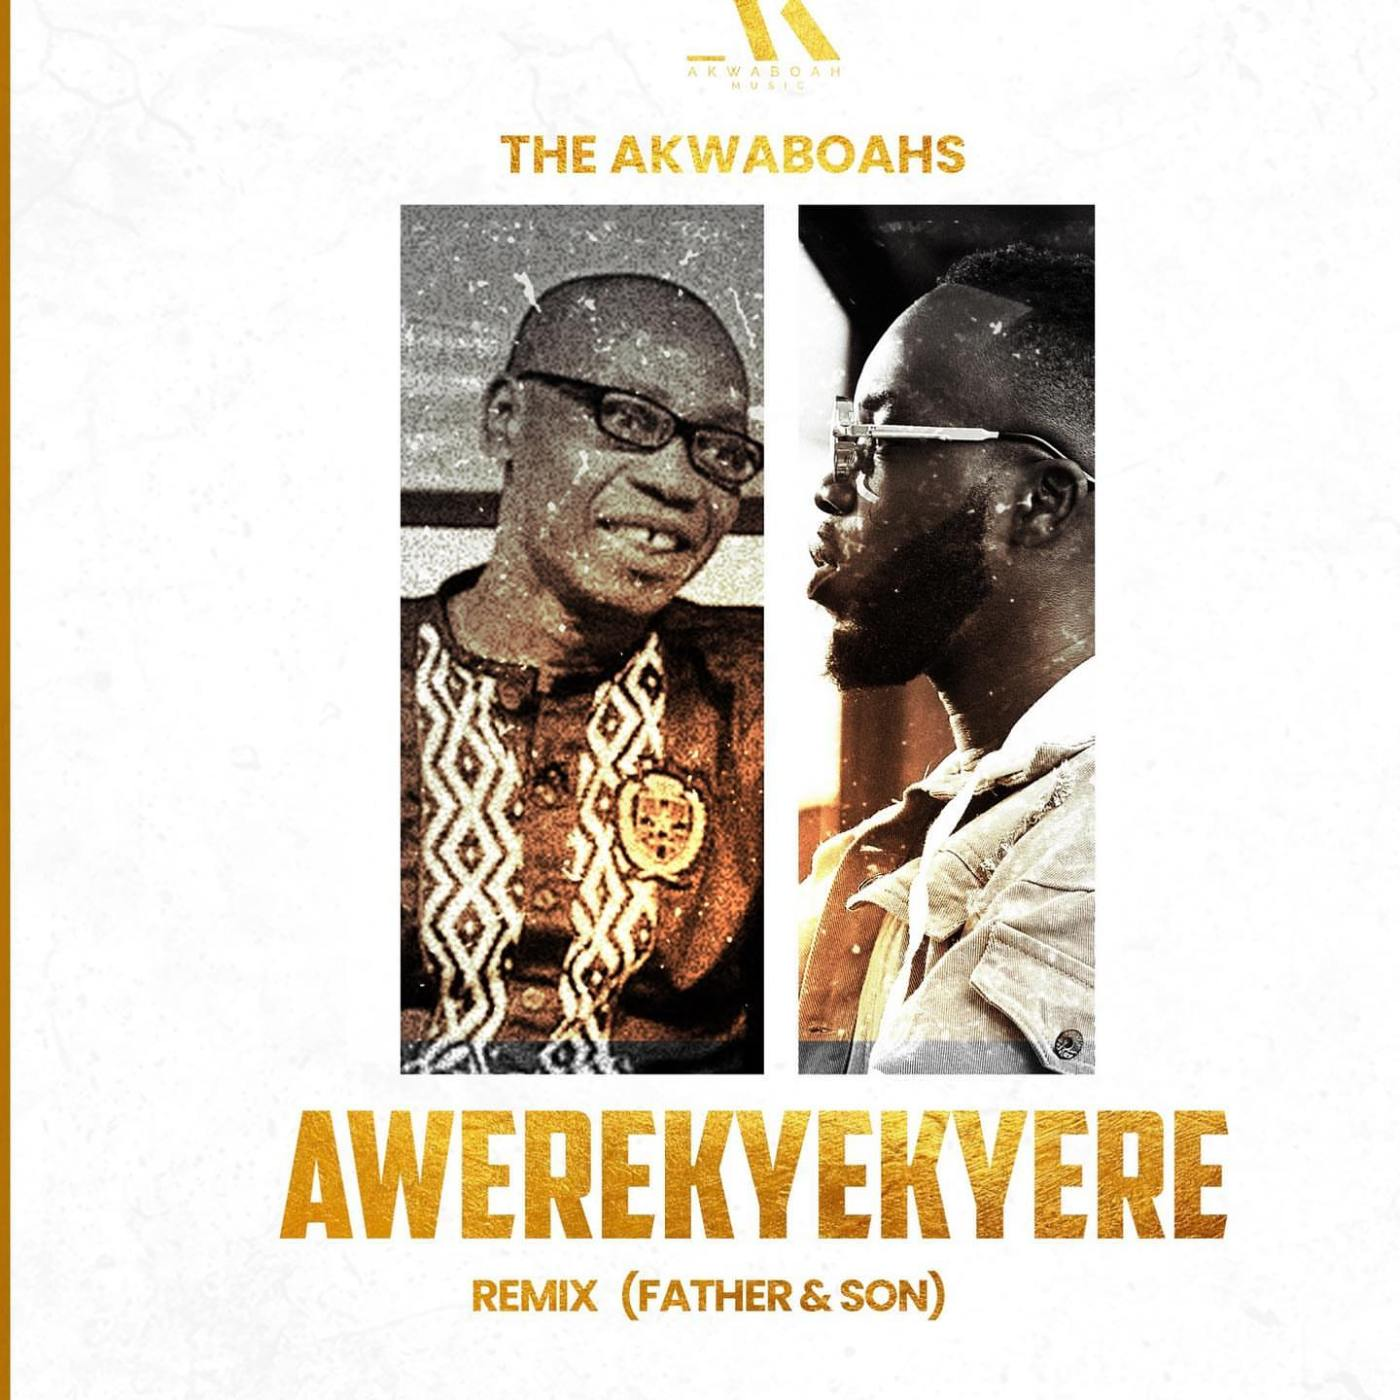 The Akwaboahs - Awerekyekyere (Remix)